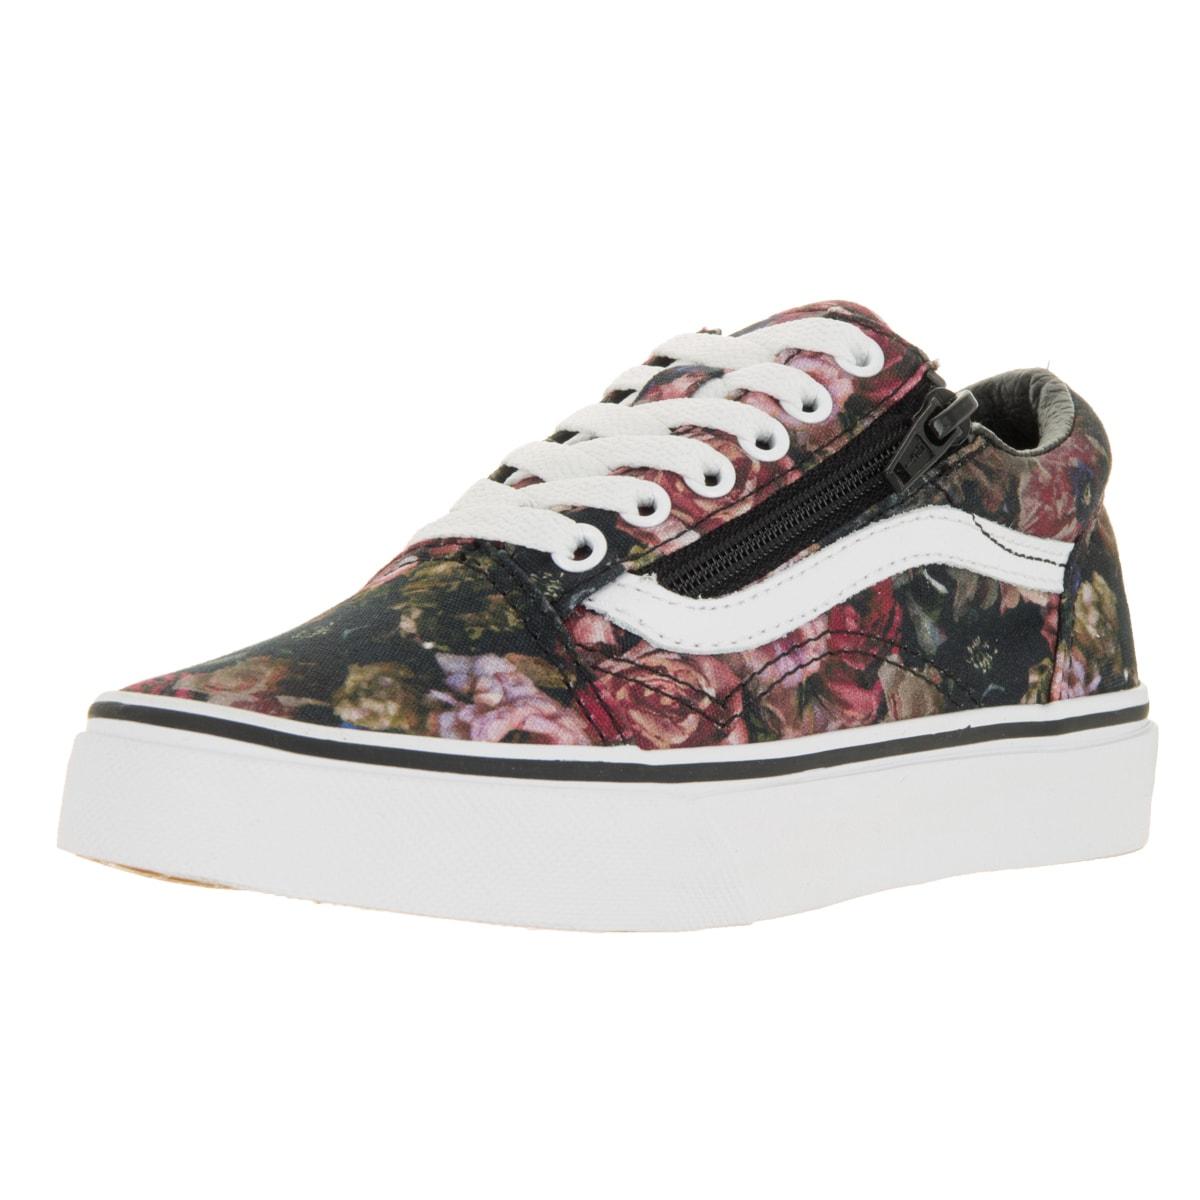 Vans Old Skool edição limitada Lux Floral R$349,99